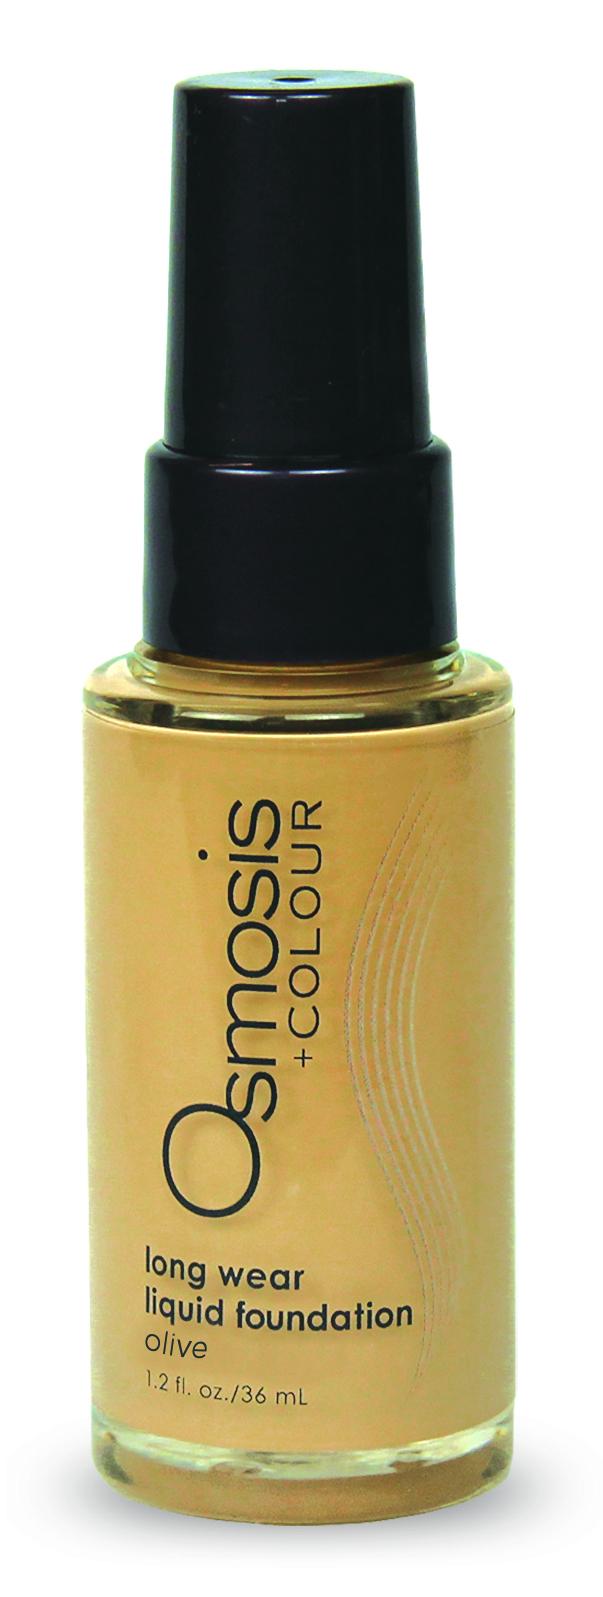 Osmosis Long Wear Liquid Foundation Olive $93